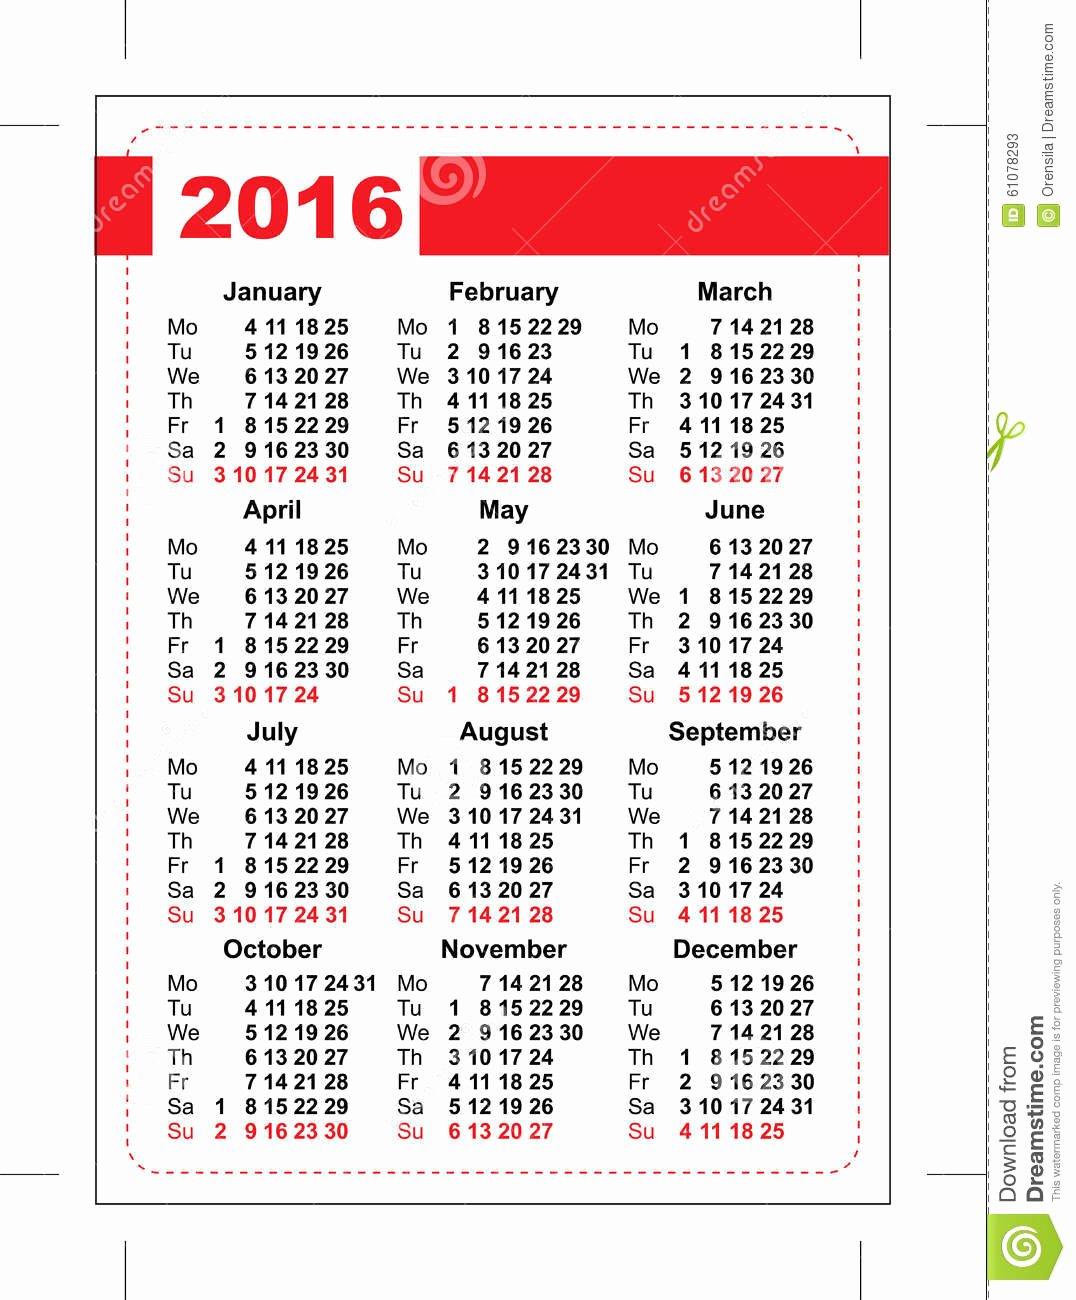 2016 Pocket Calendar Template Grid Vertical orientation